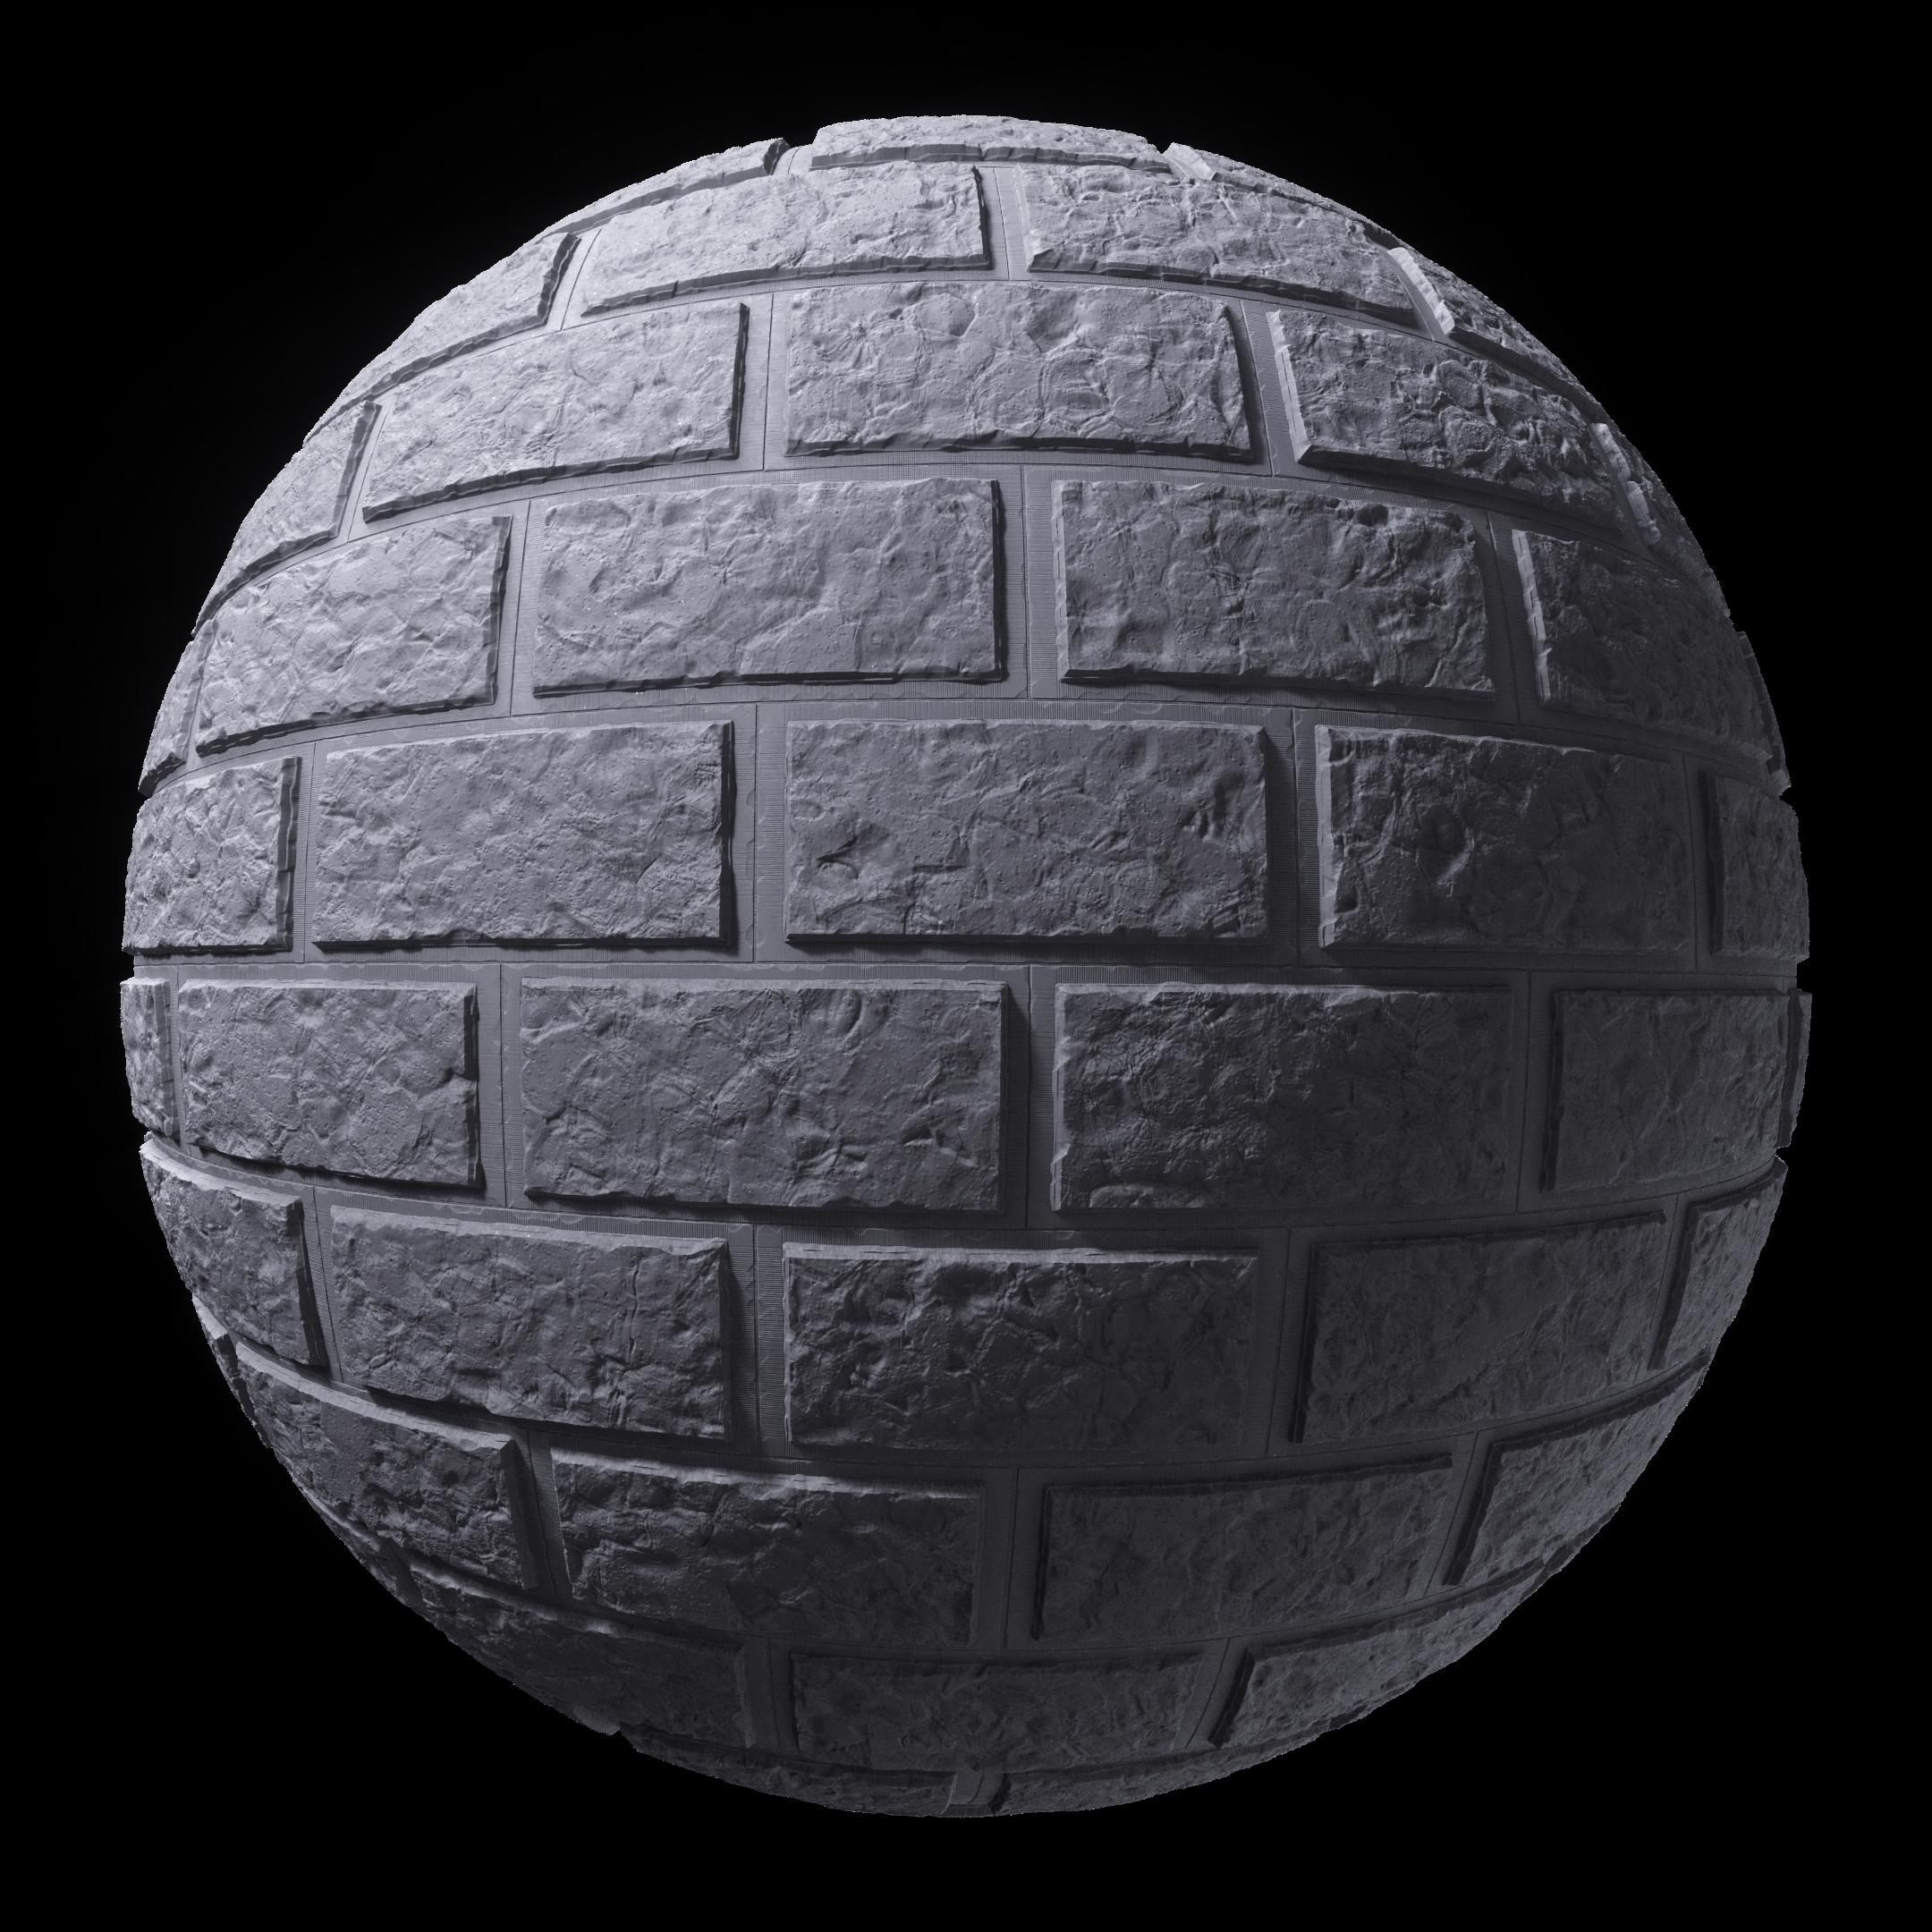 Tcom_Brick_StoneWall_thumb1.png